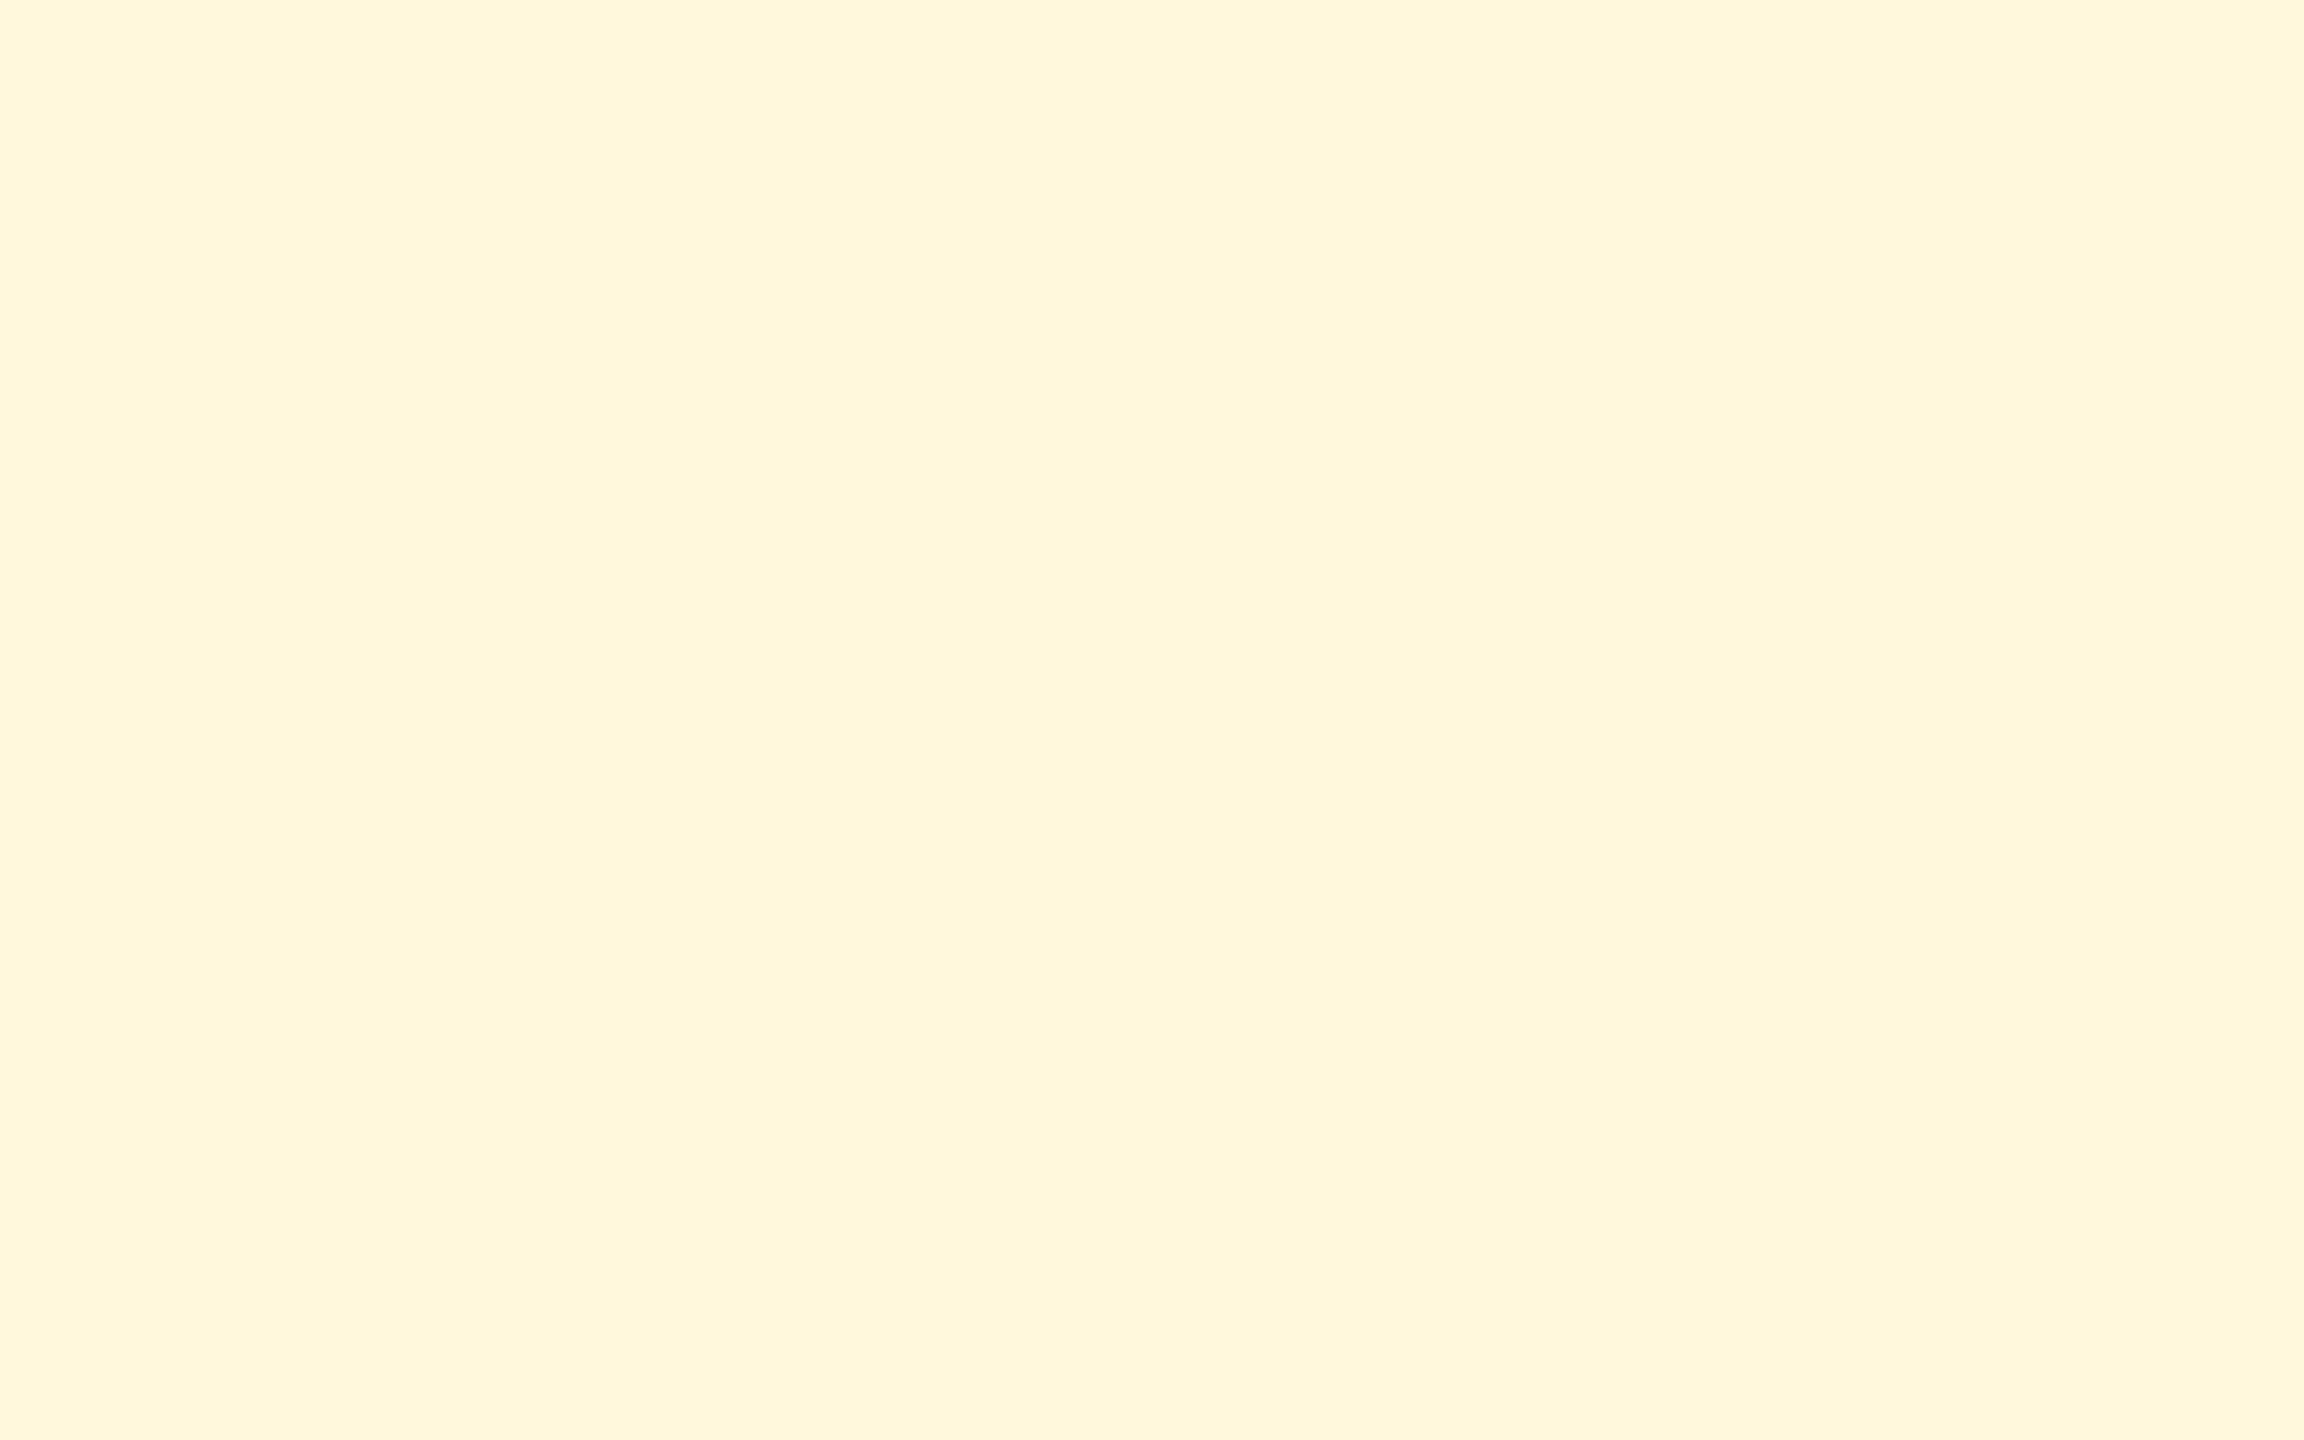 2304x1440 Cornsilk Solid Color Background